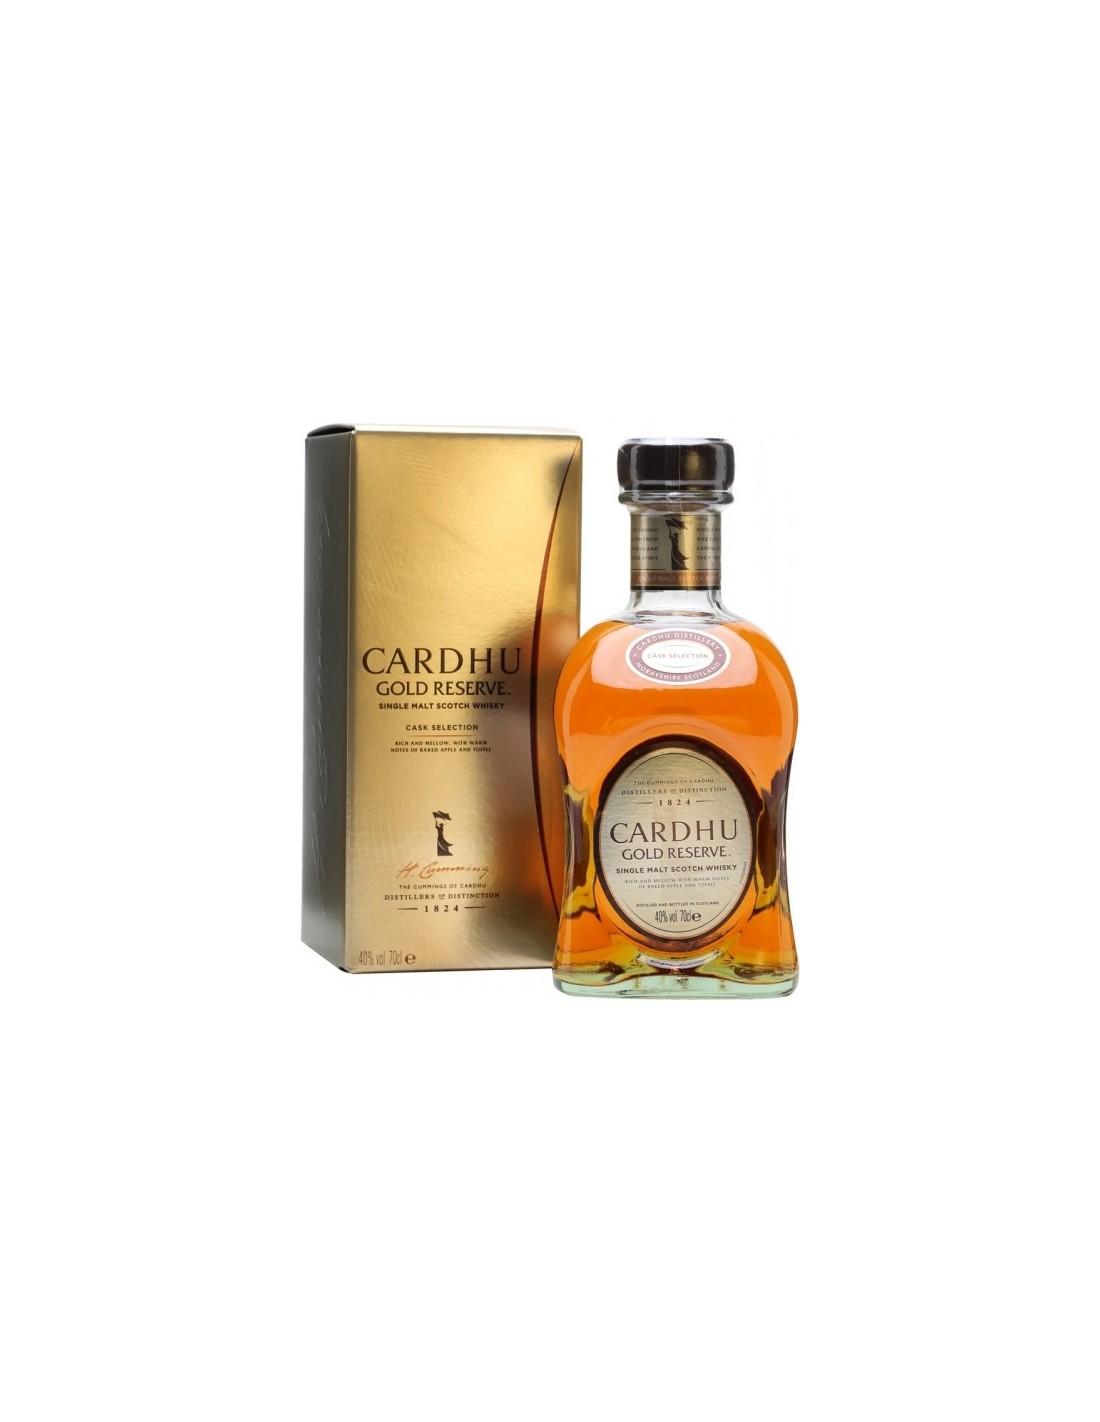 Whisky Cardhu Gold Reserve, 40% alc., 0.7L, Scotia